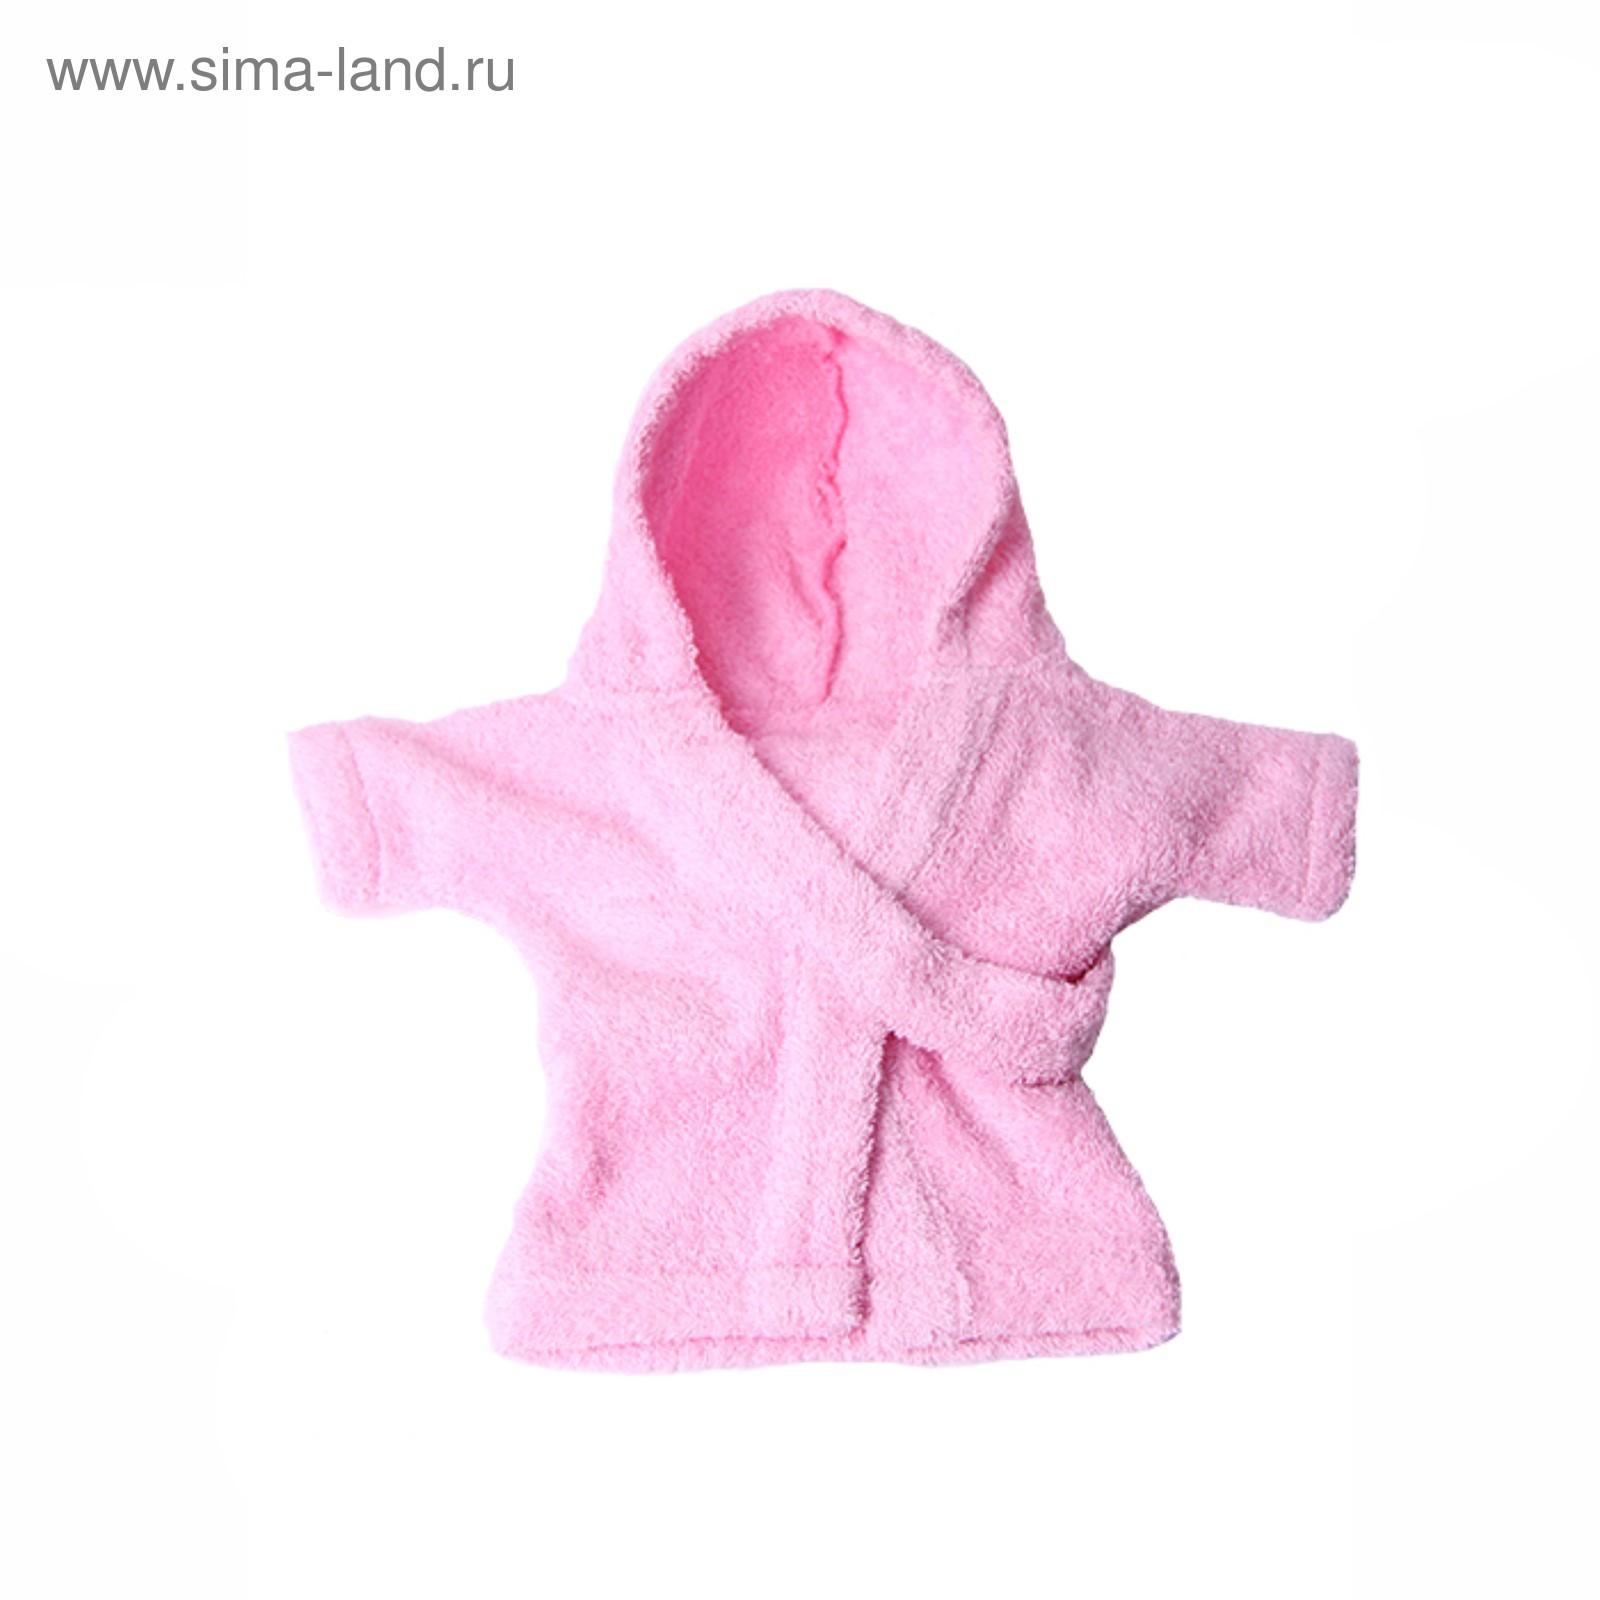 c6527f54e415f Халат Pretty Pet, размер S (ДС 23-25 см, ОГ 36-38 см), розовый ...